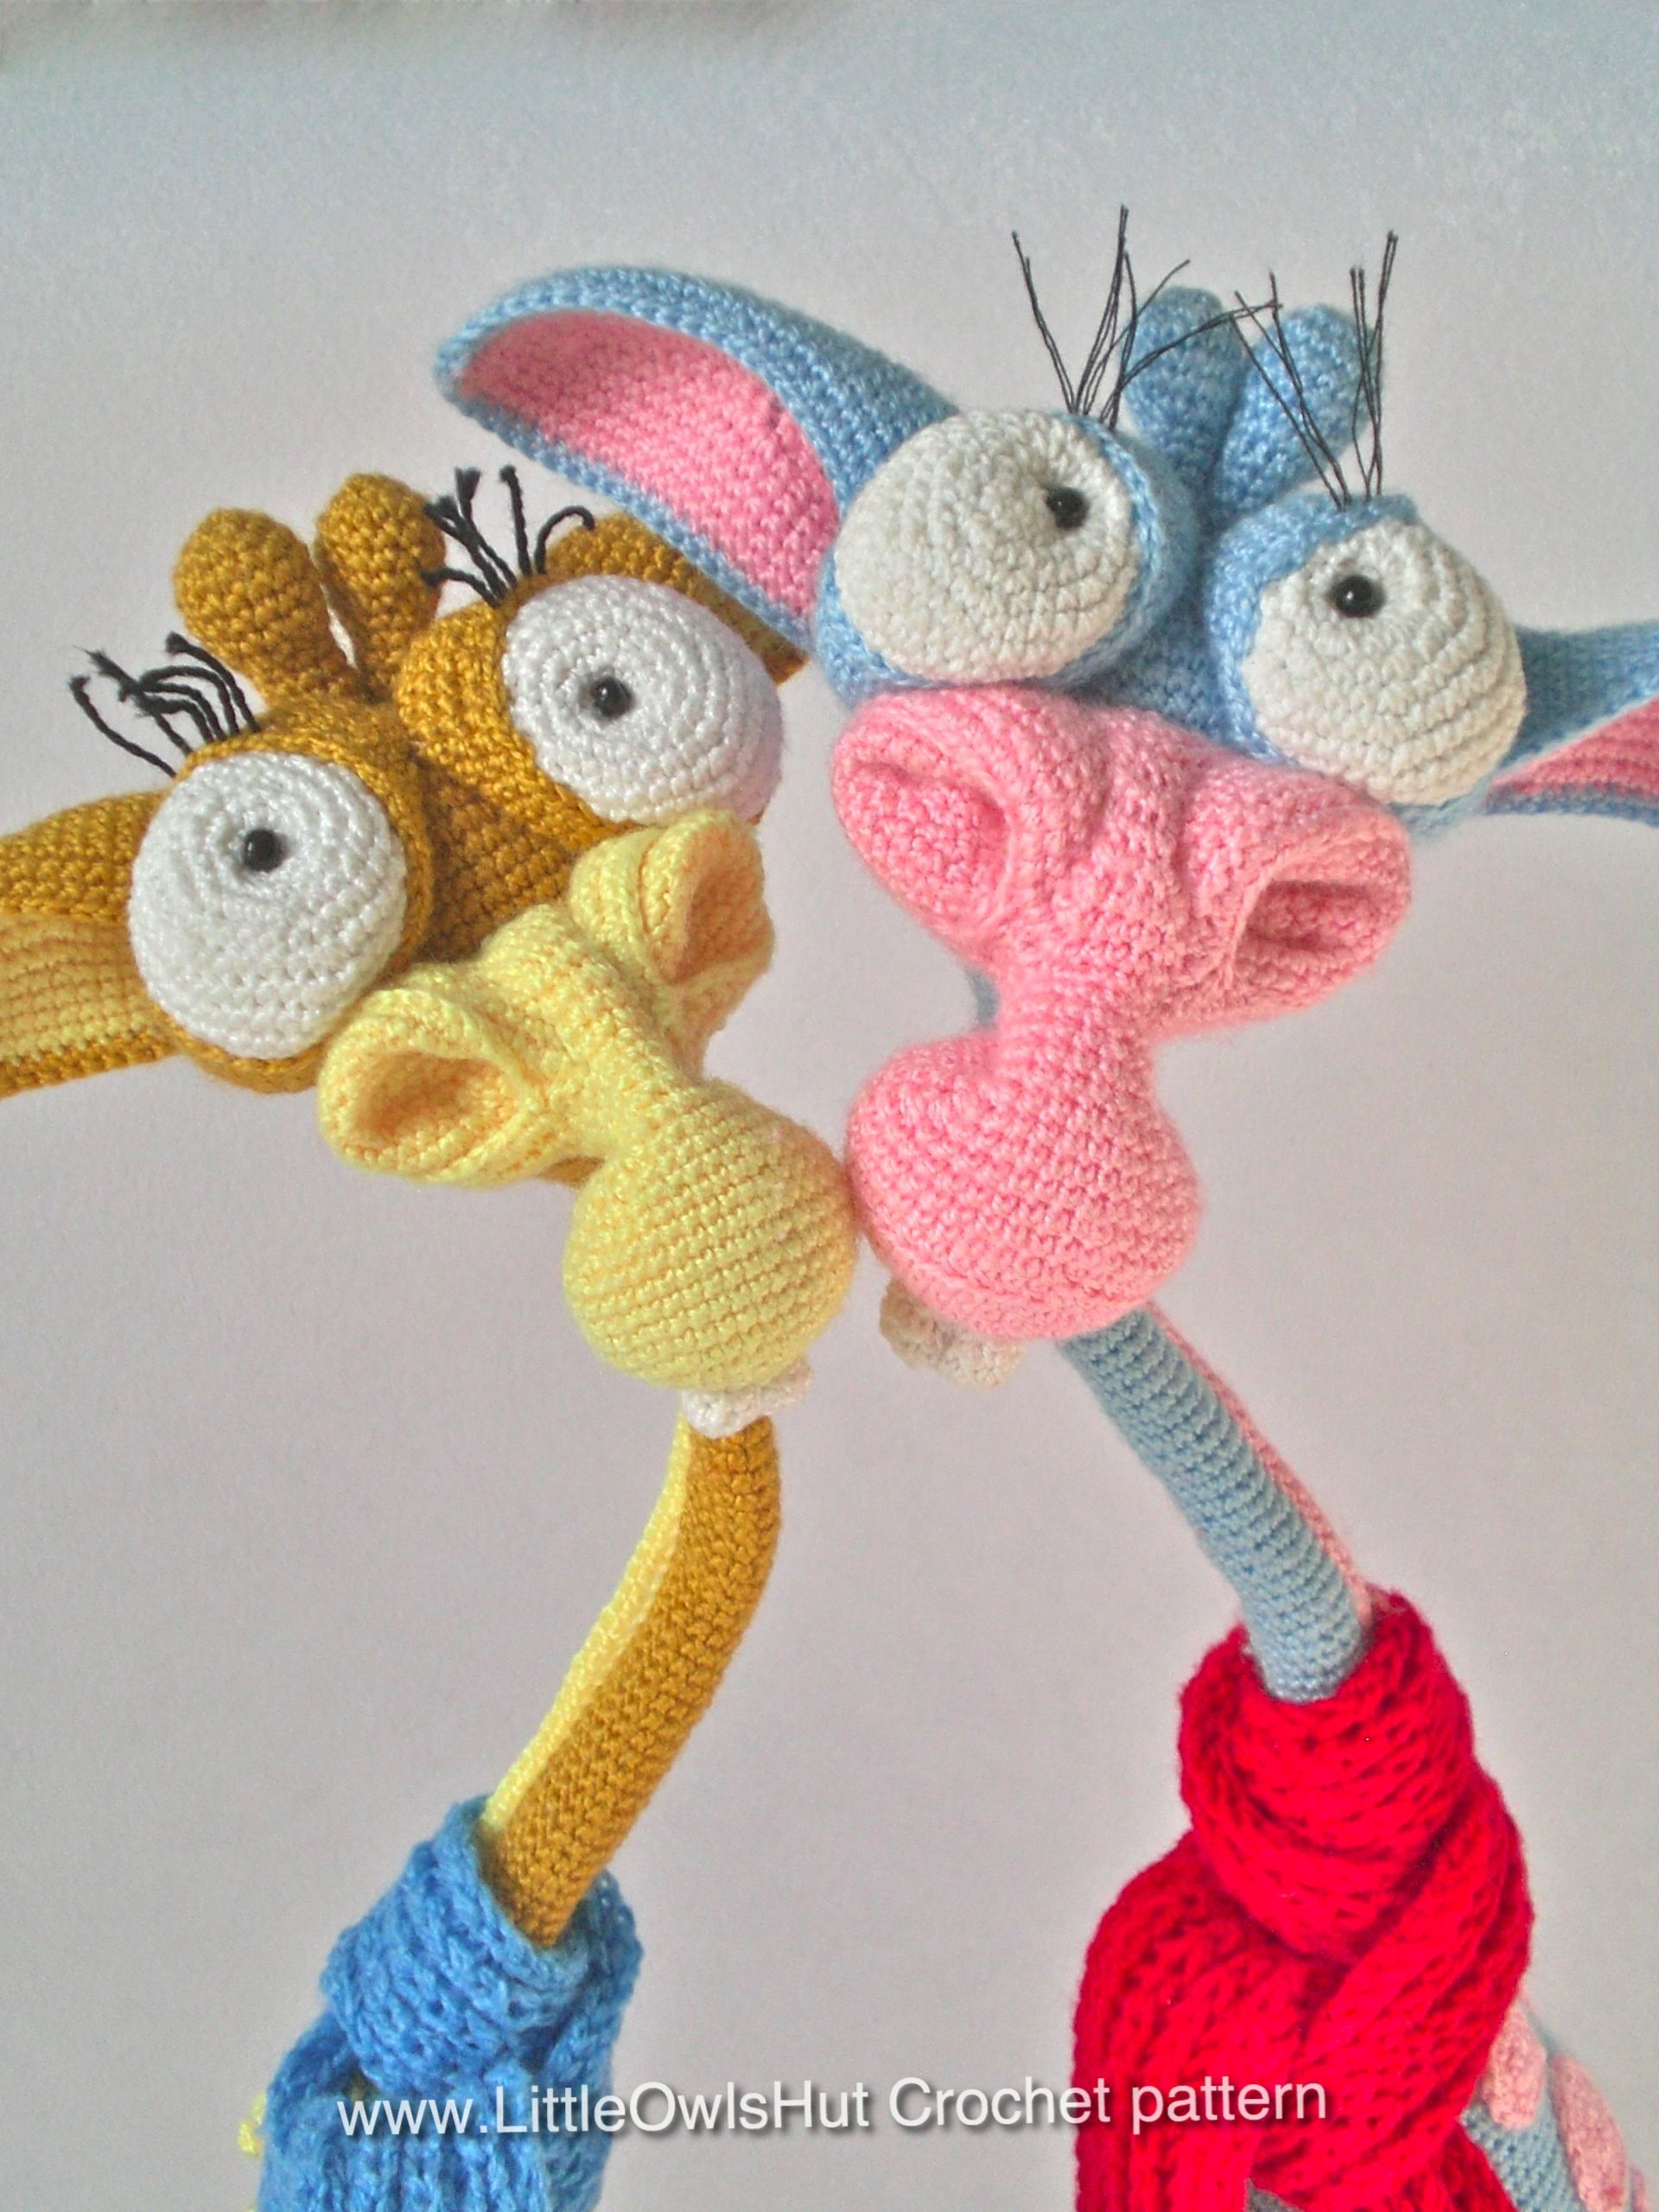 Project By Natalya Dorohan Giraffe George Amigurumi Crochet Pattern By Galina Astashova For Littleowlshut Www Giraffe Crochet Crochet Dolls Crochet Patterns